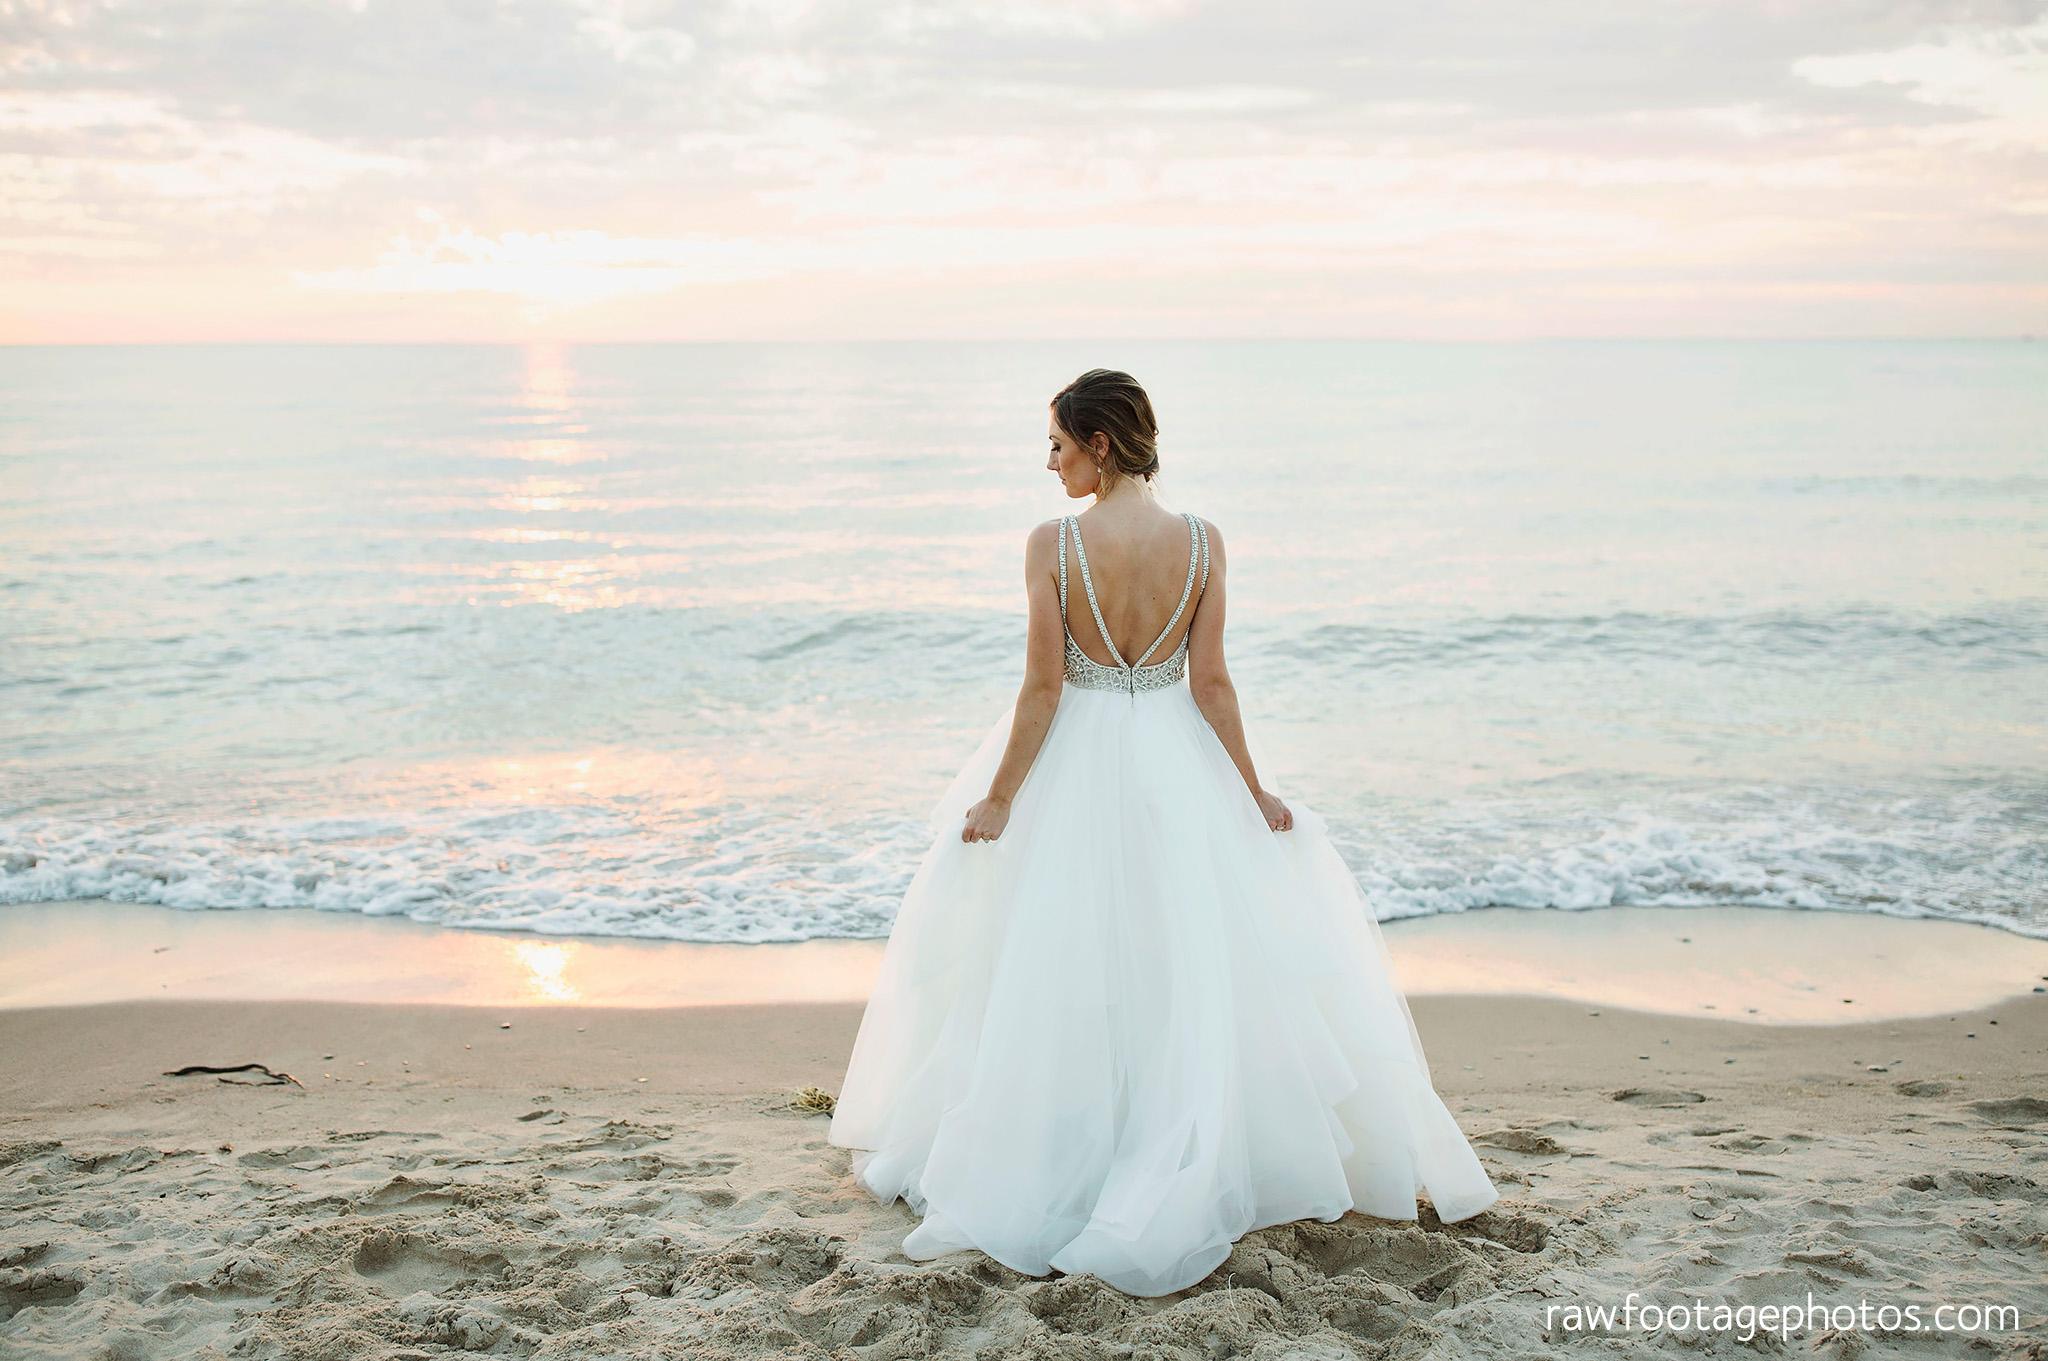 london_ontario_wedding_photographer-grand_bend_wedding_photographer-oakwood_resort_wedding-beach_wedding-sunset_wedding-raw_footage_photography071.jpg